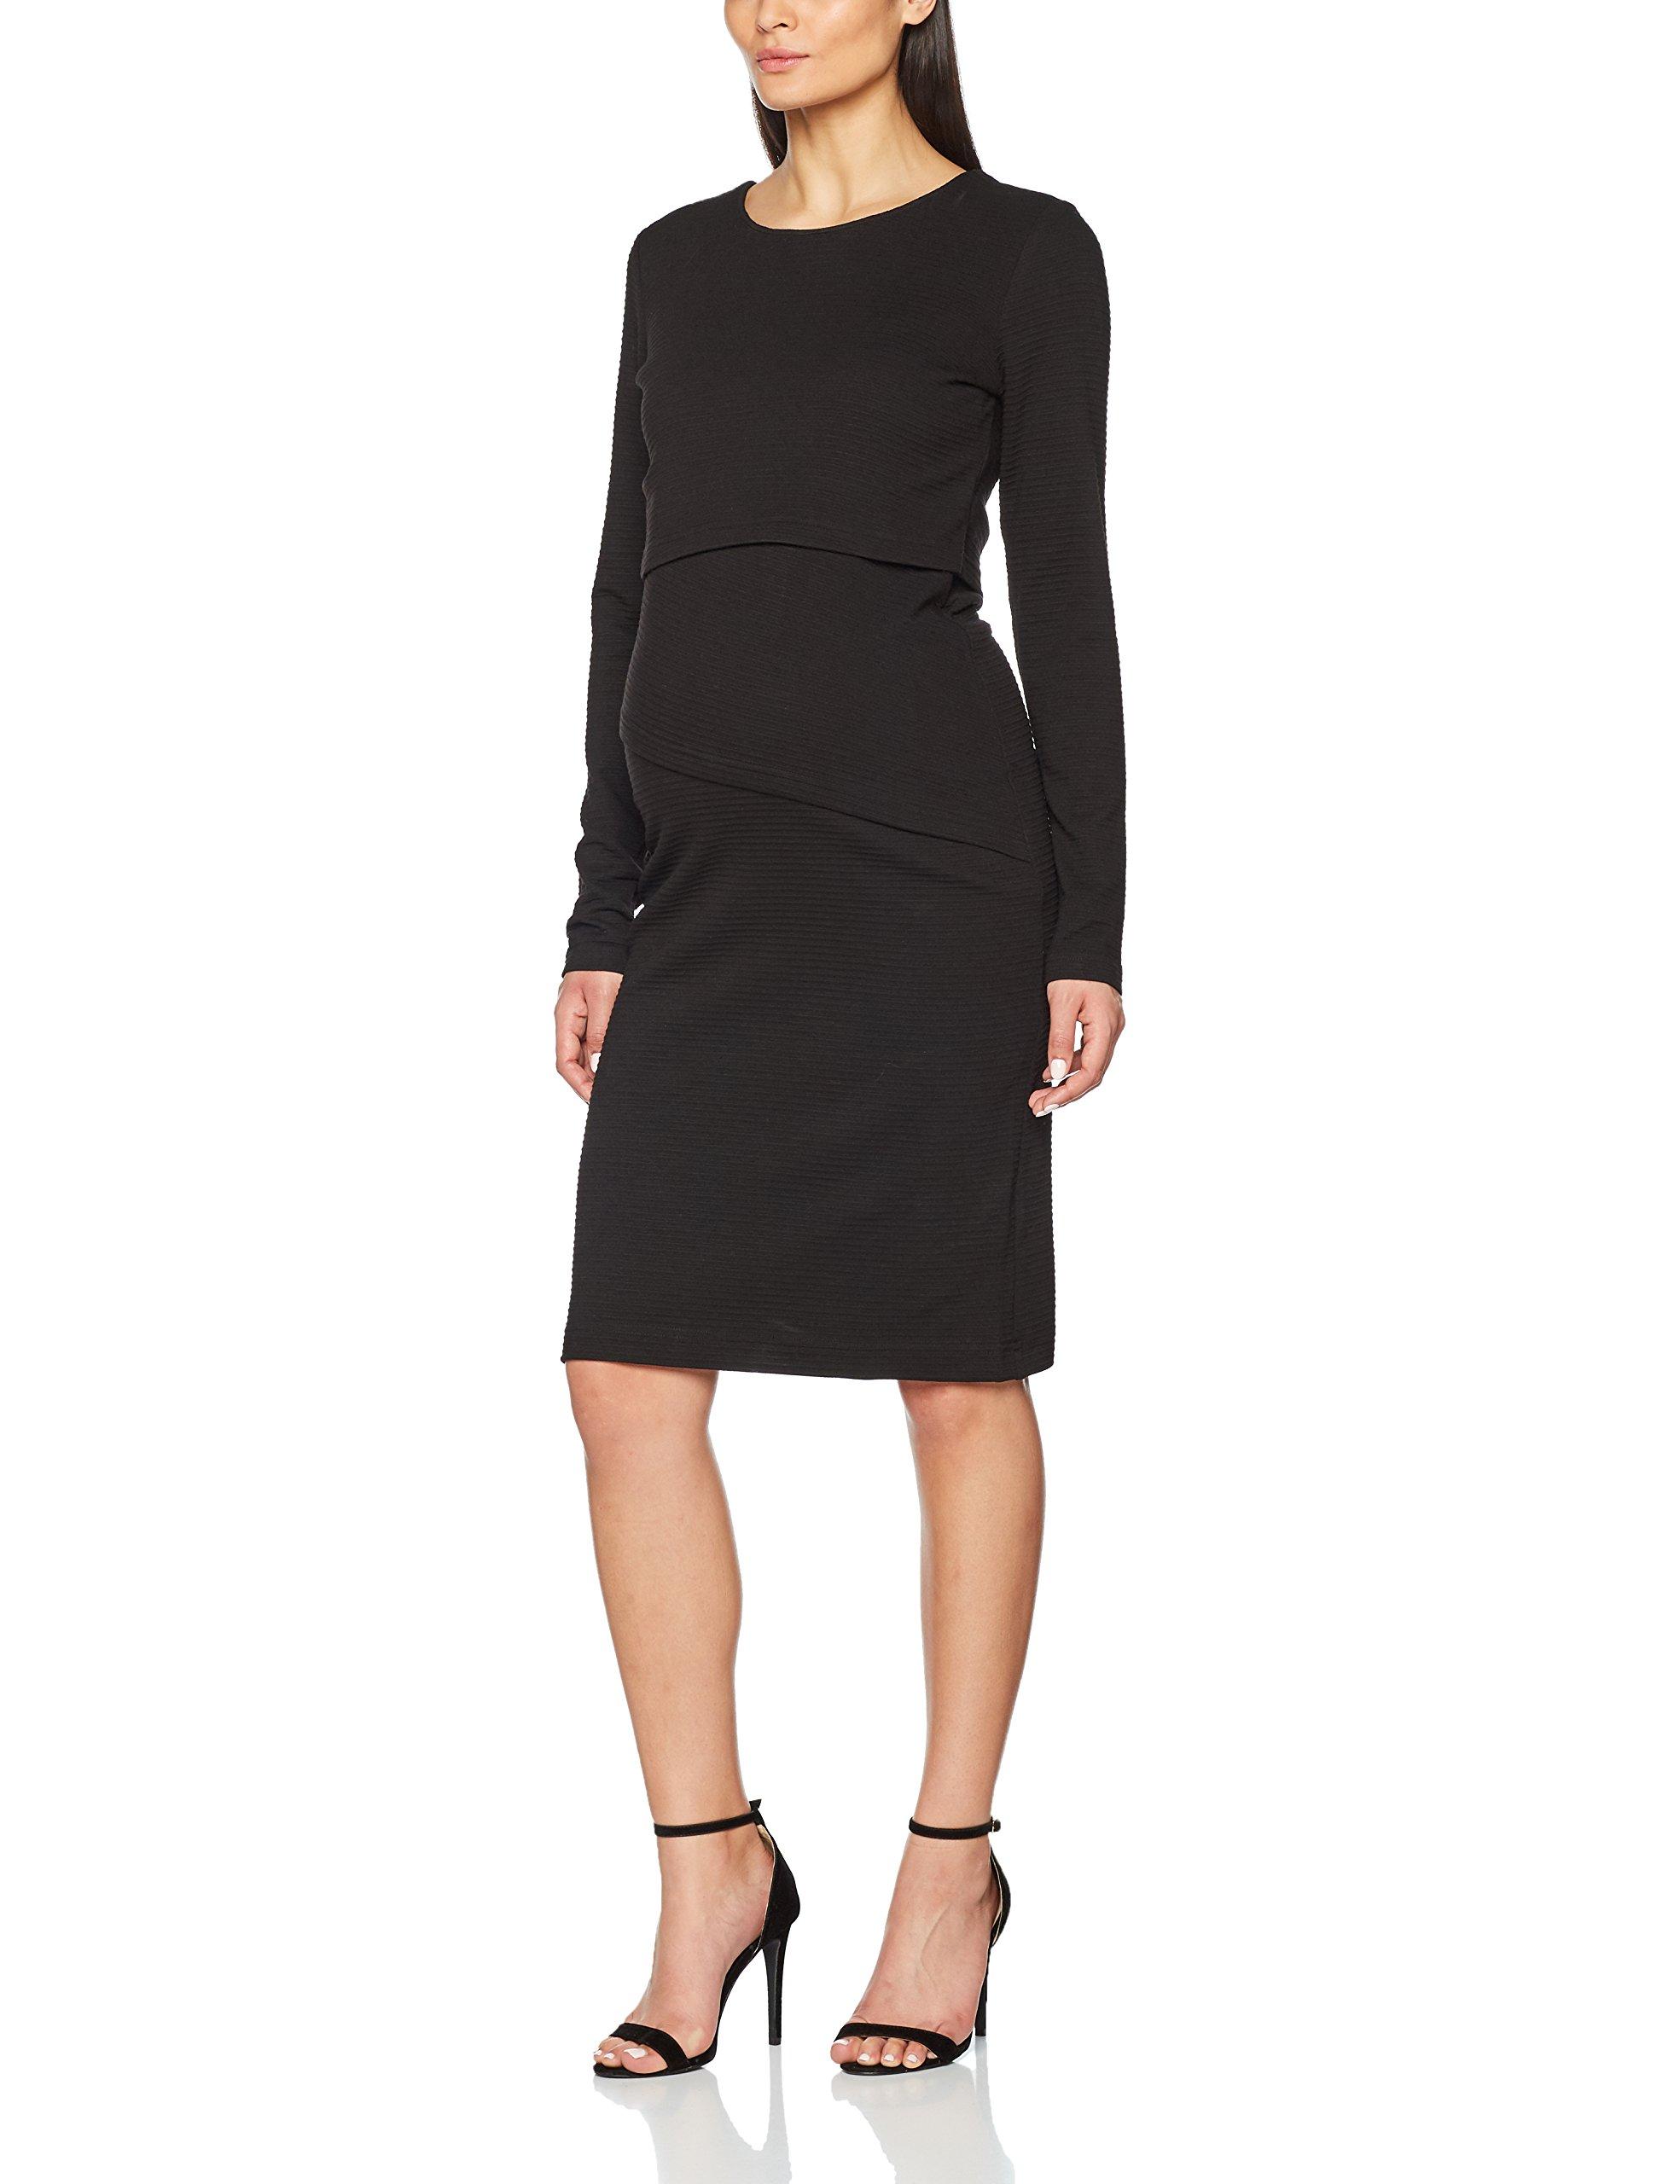 Nurs FabricantMFemme maternitéNoirblack Balou Dress C27040taille Ls Robe Noppies OuXklwPiTZ